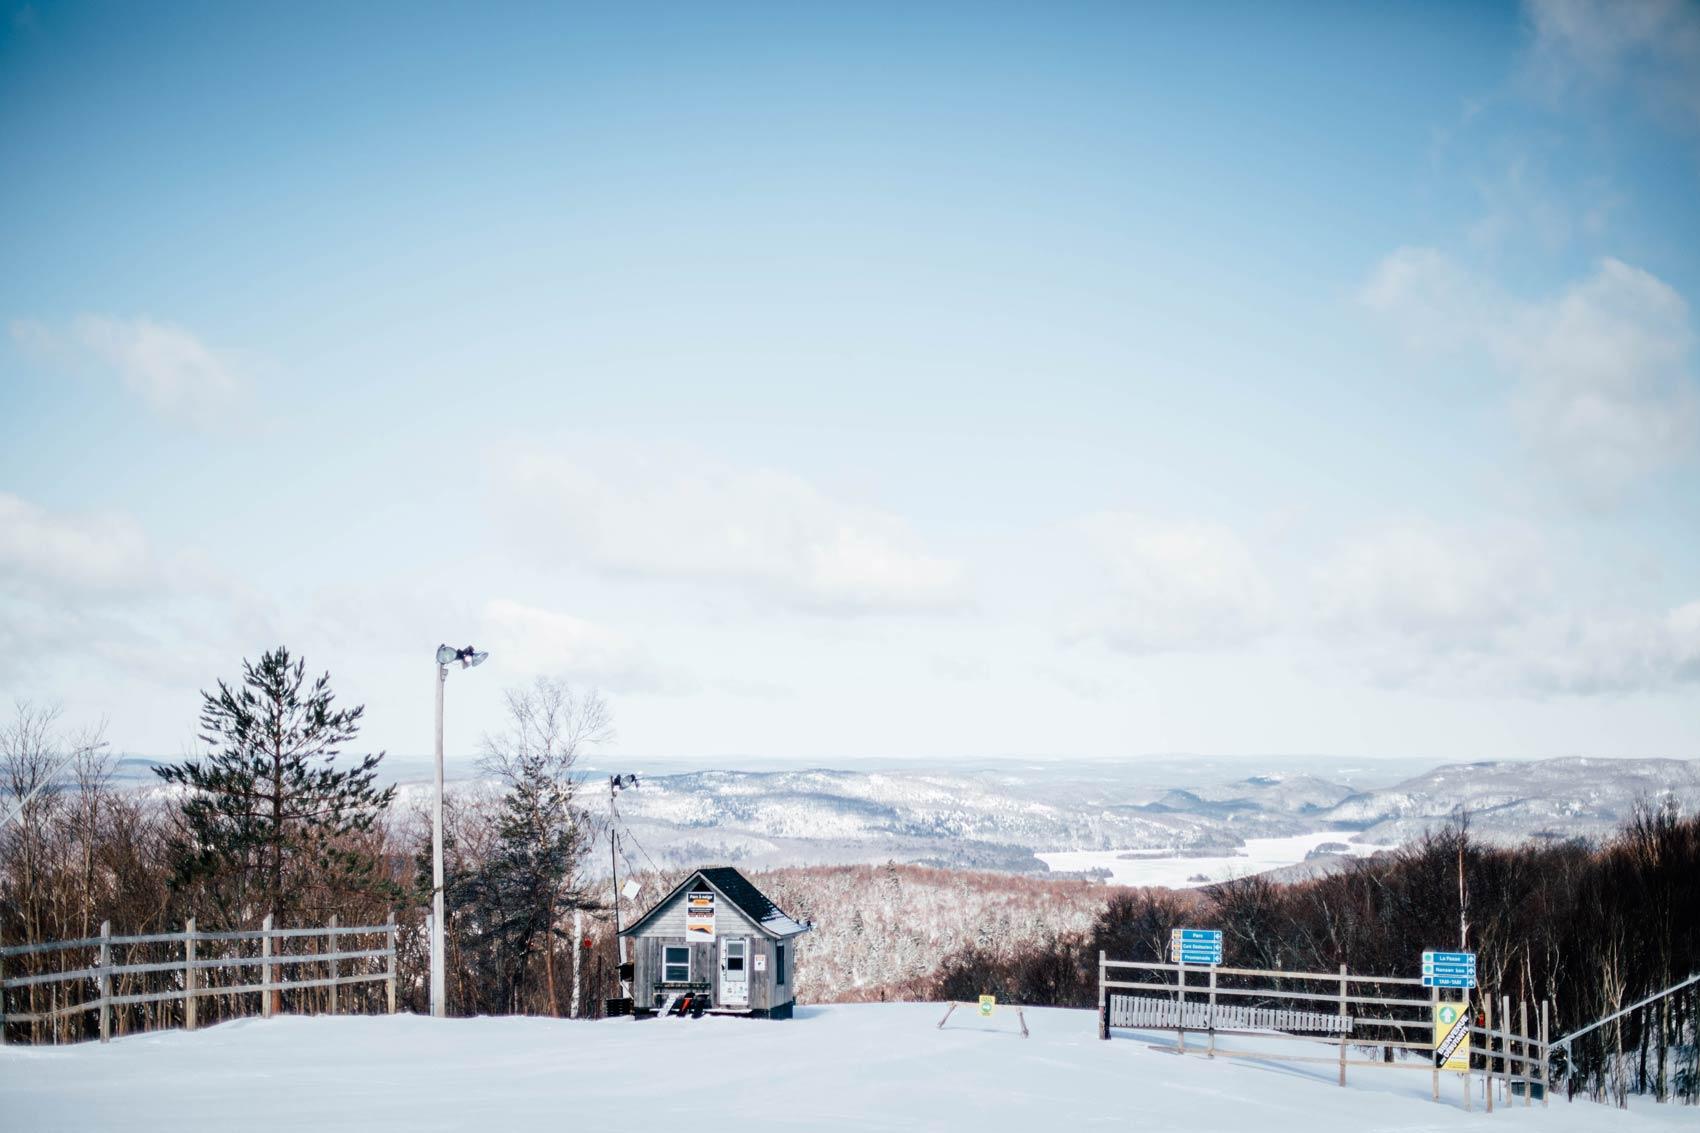 station de ski Tremblant Québec